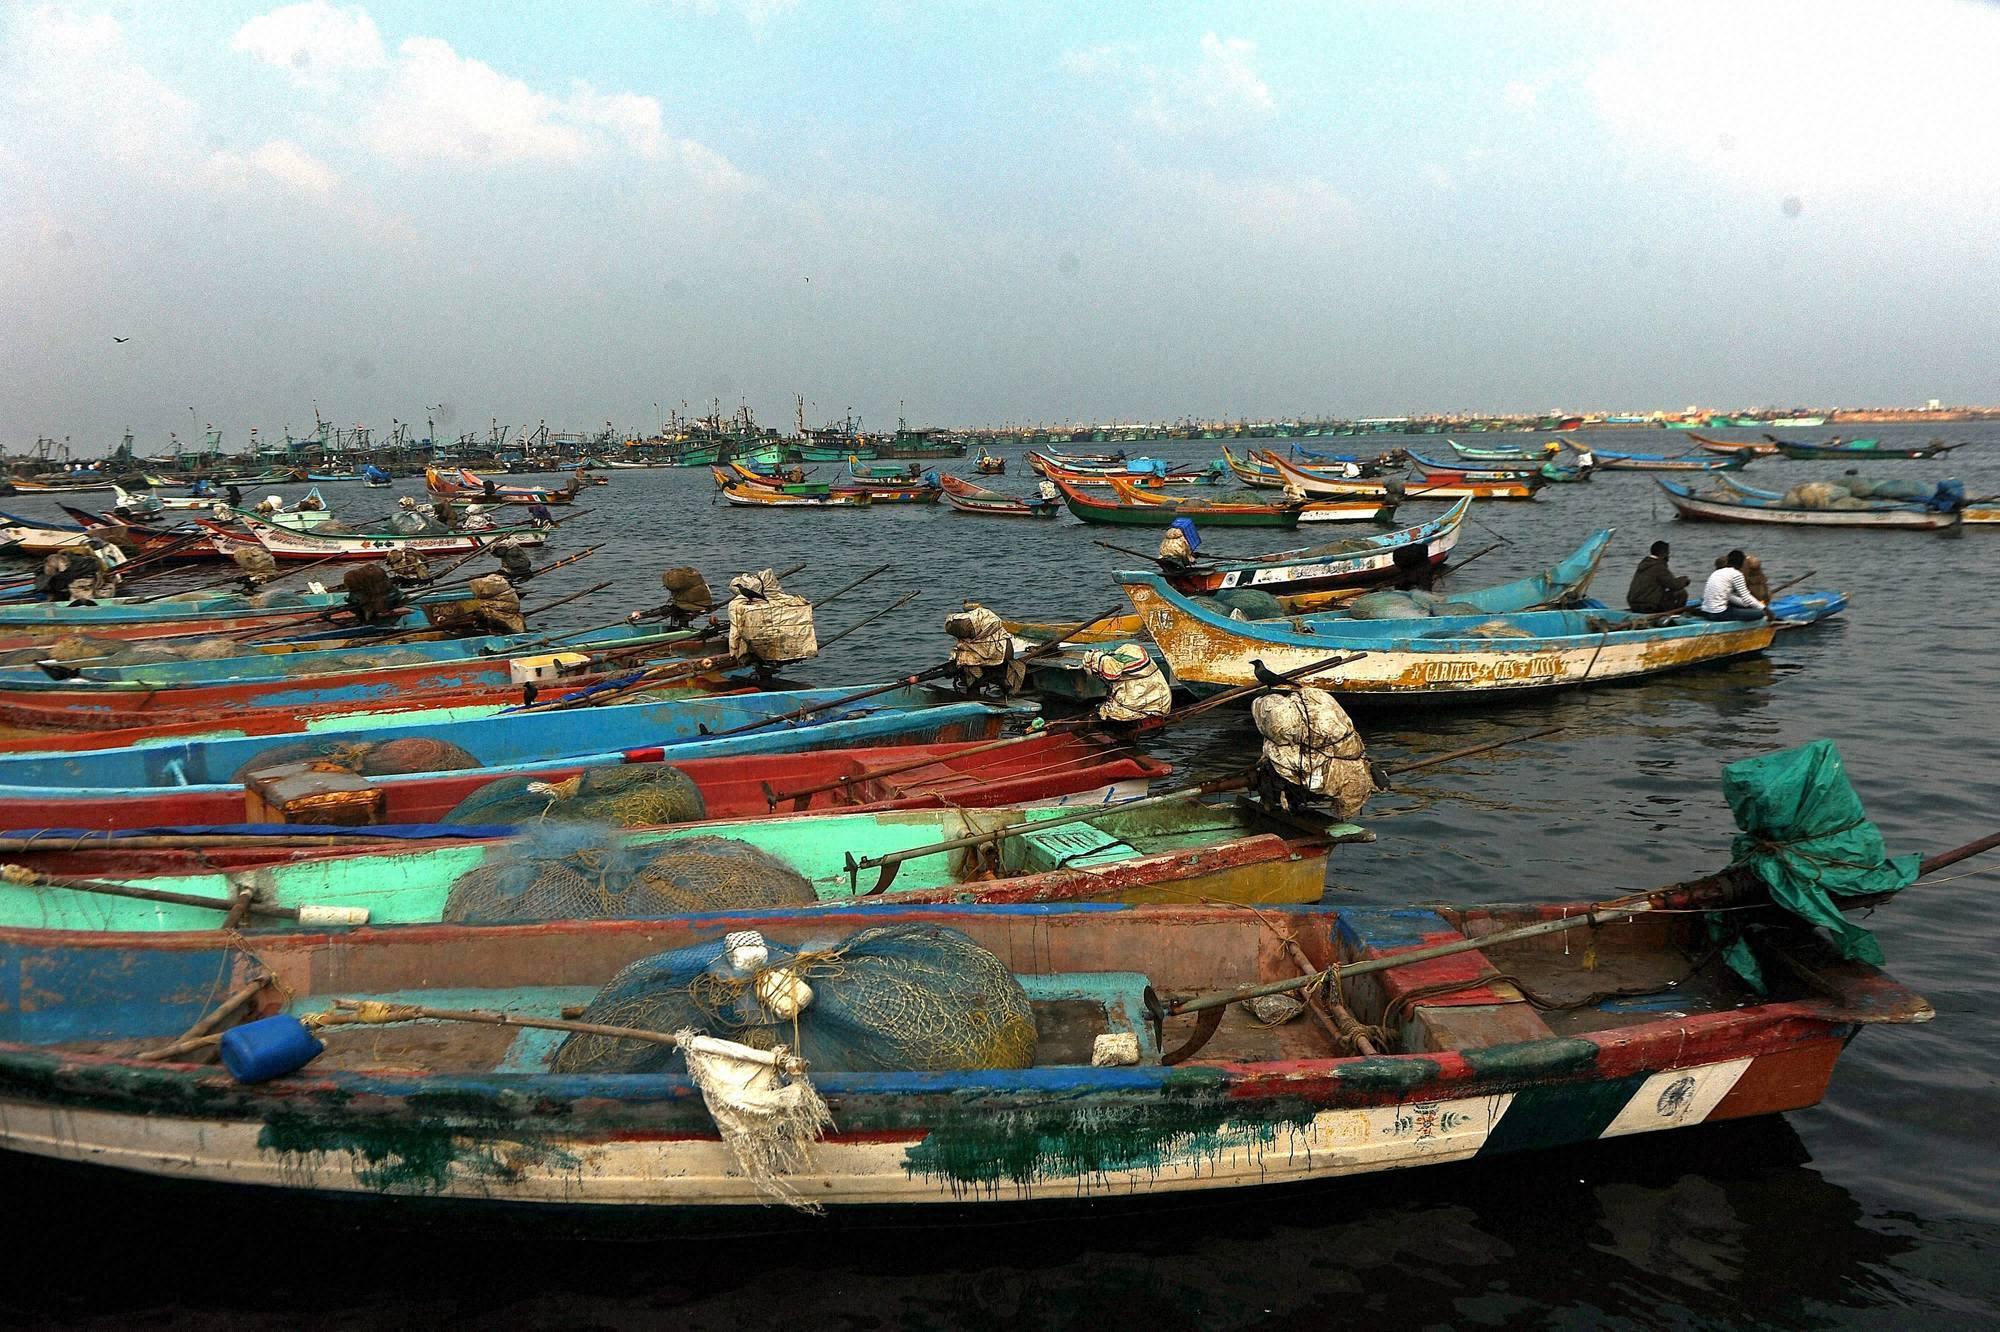 Cyclonic storm 'Nada' to cross Tamil Nadu coast on December 2